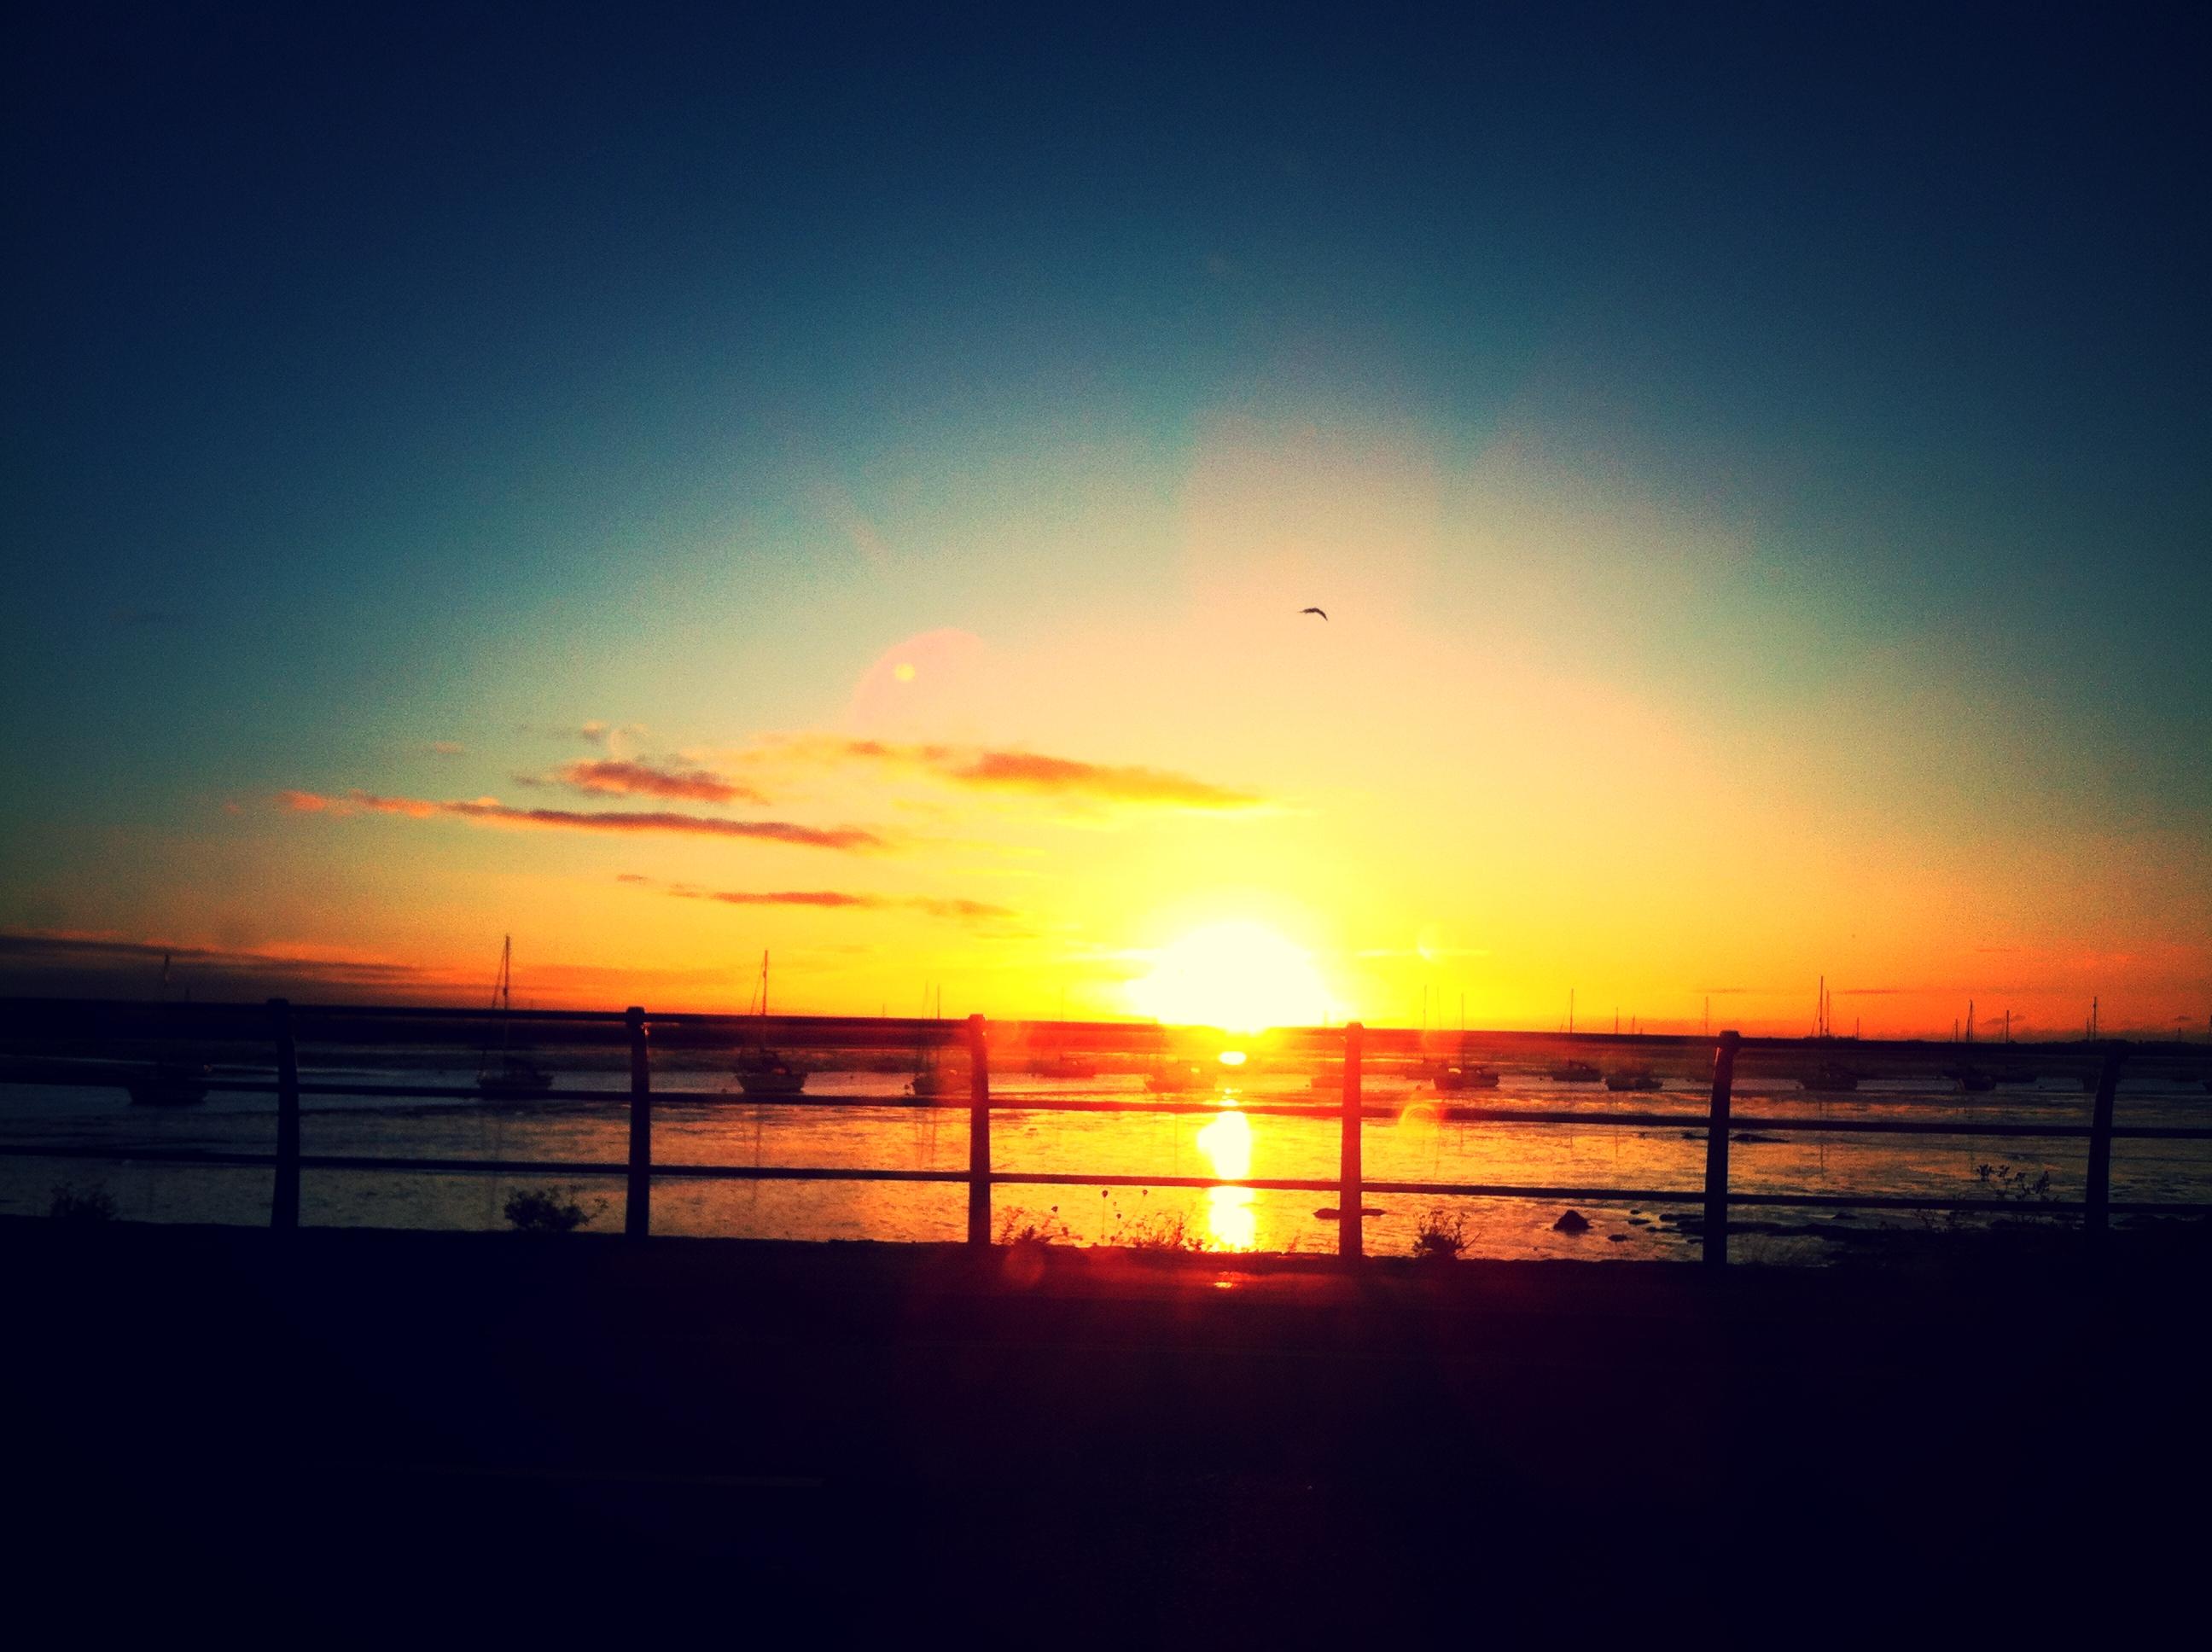 Fareham Hampshire Uk Sunrise Sunset Times